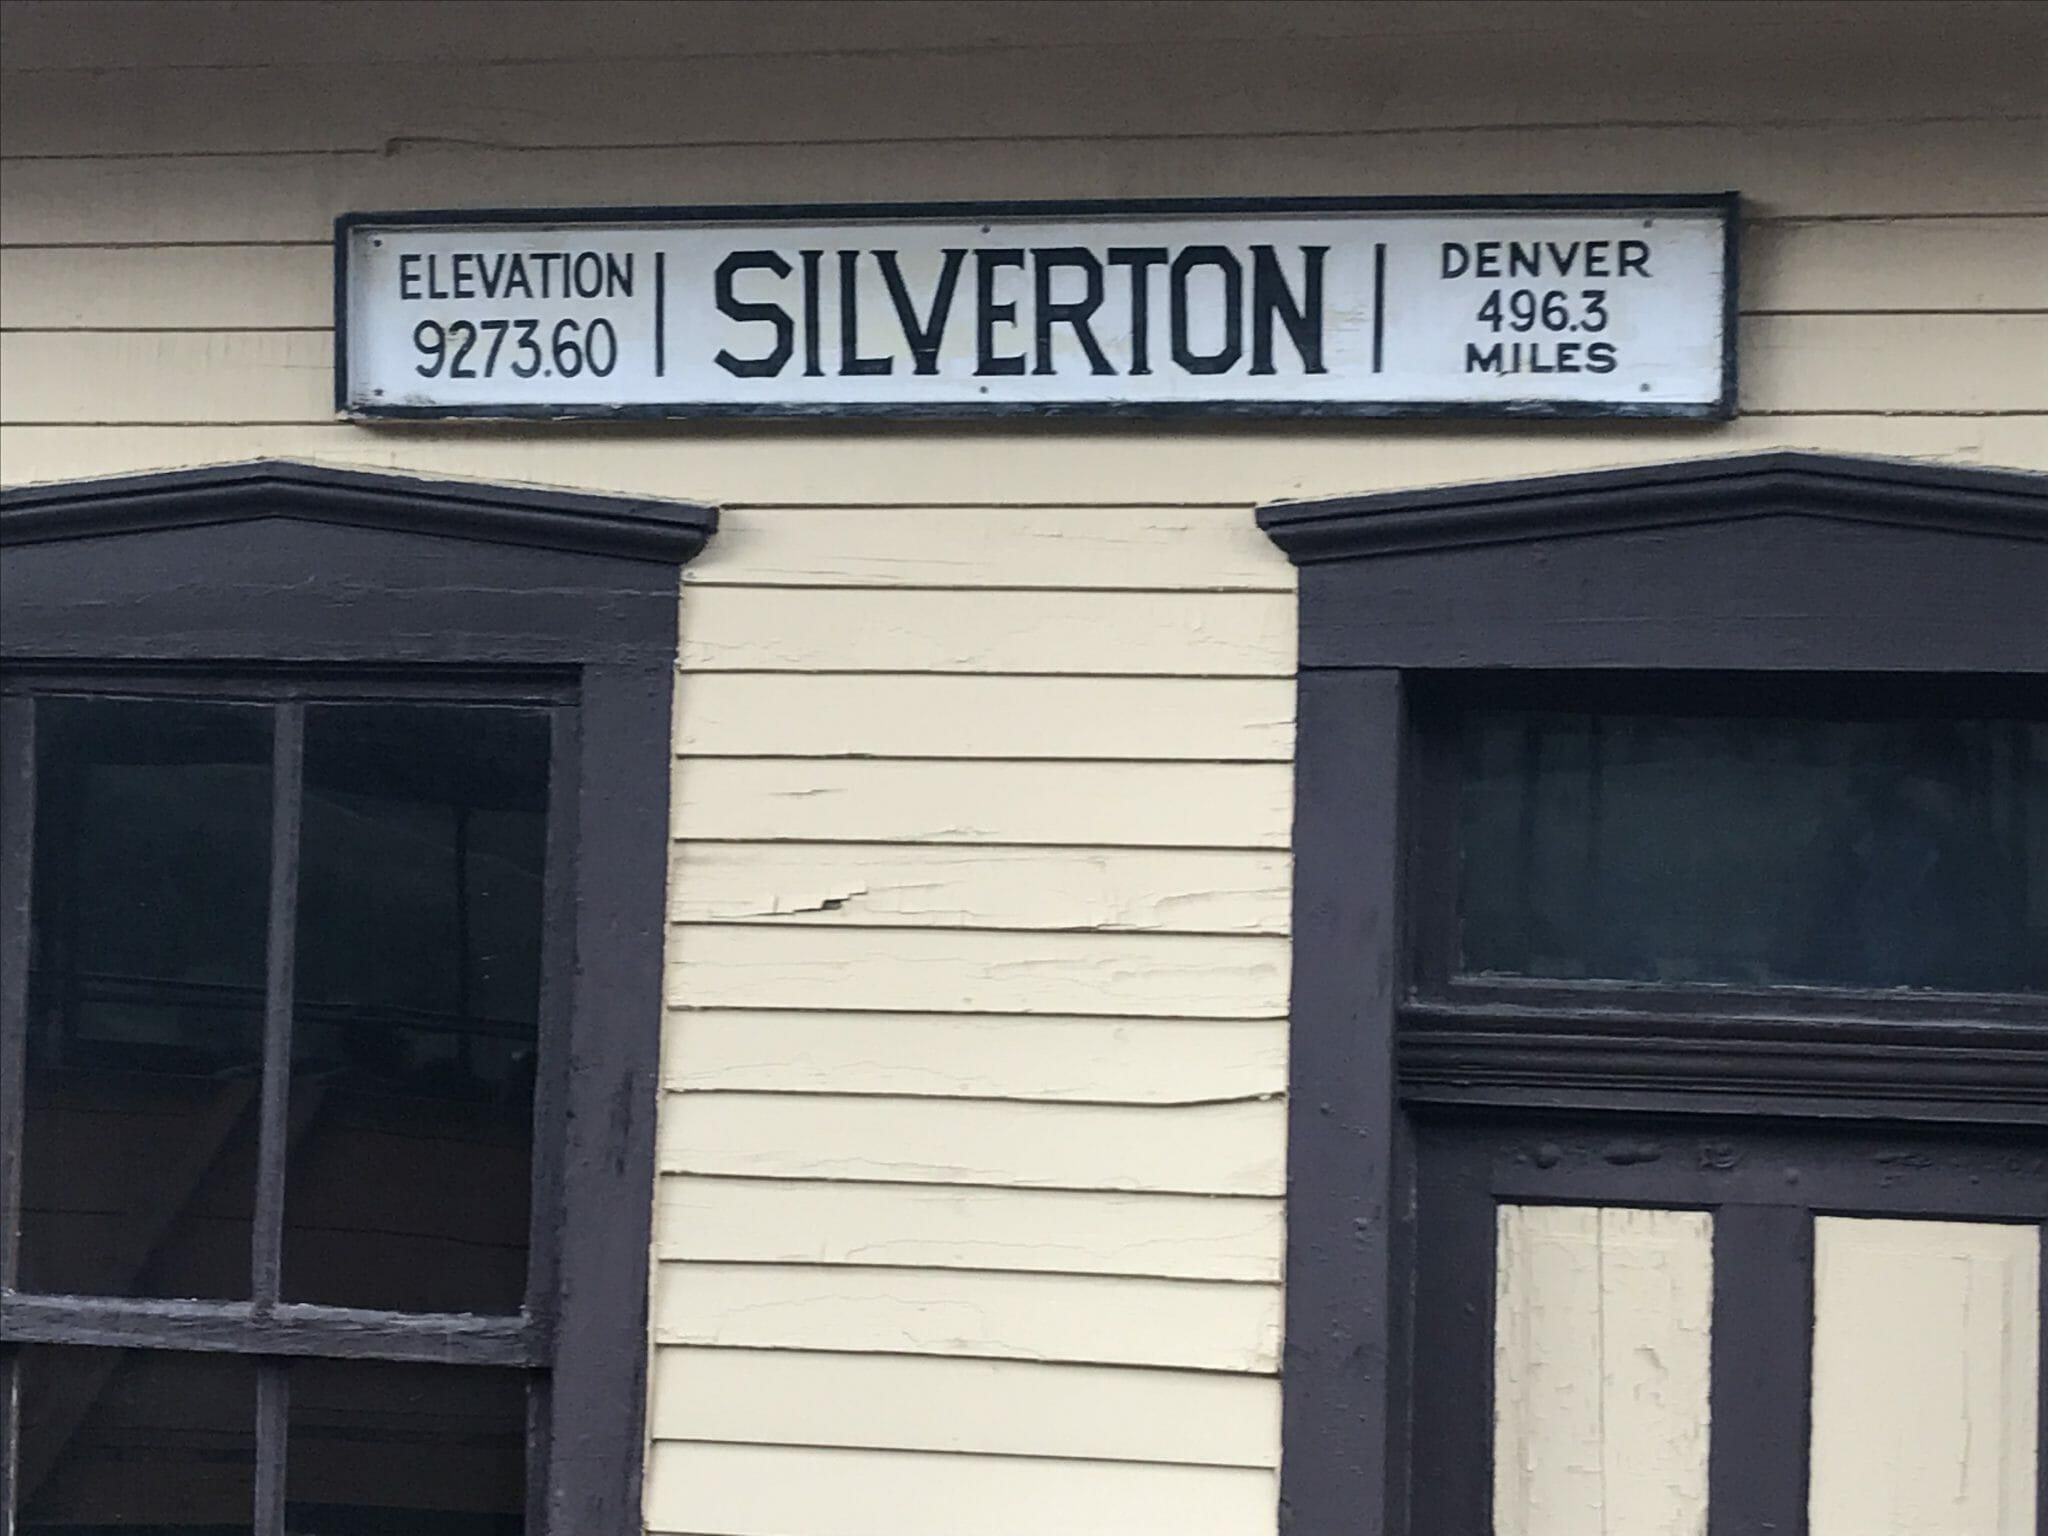 Ddurango silverton train silverton station